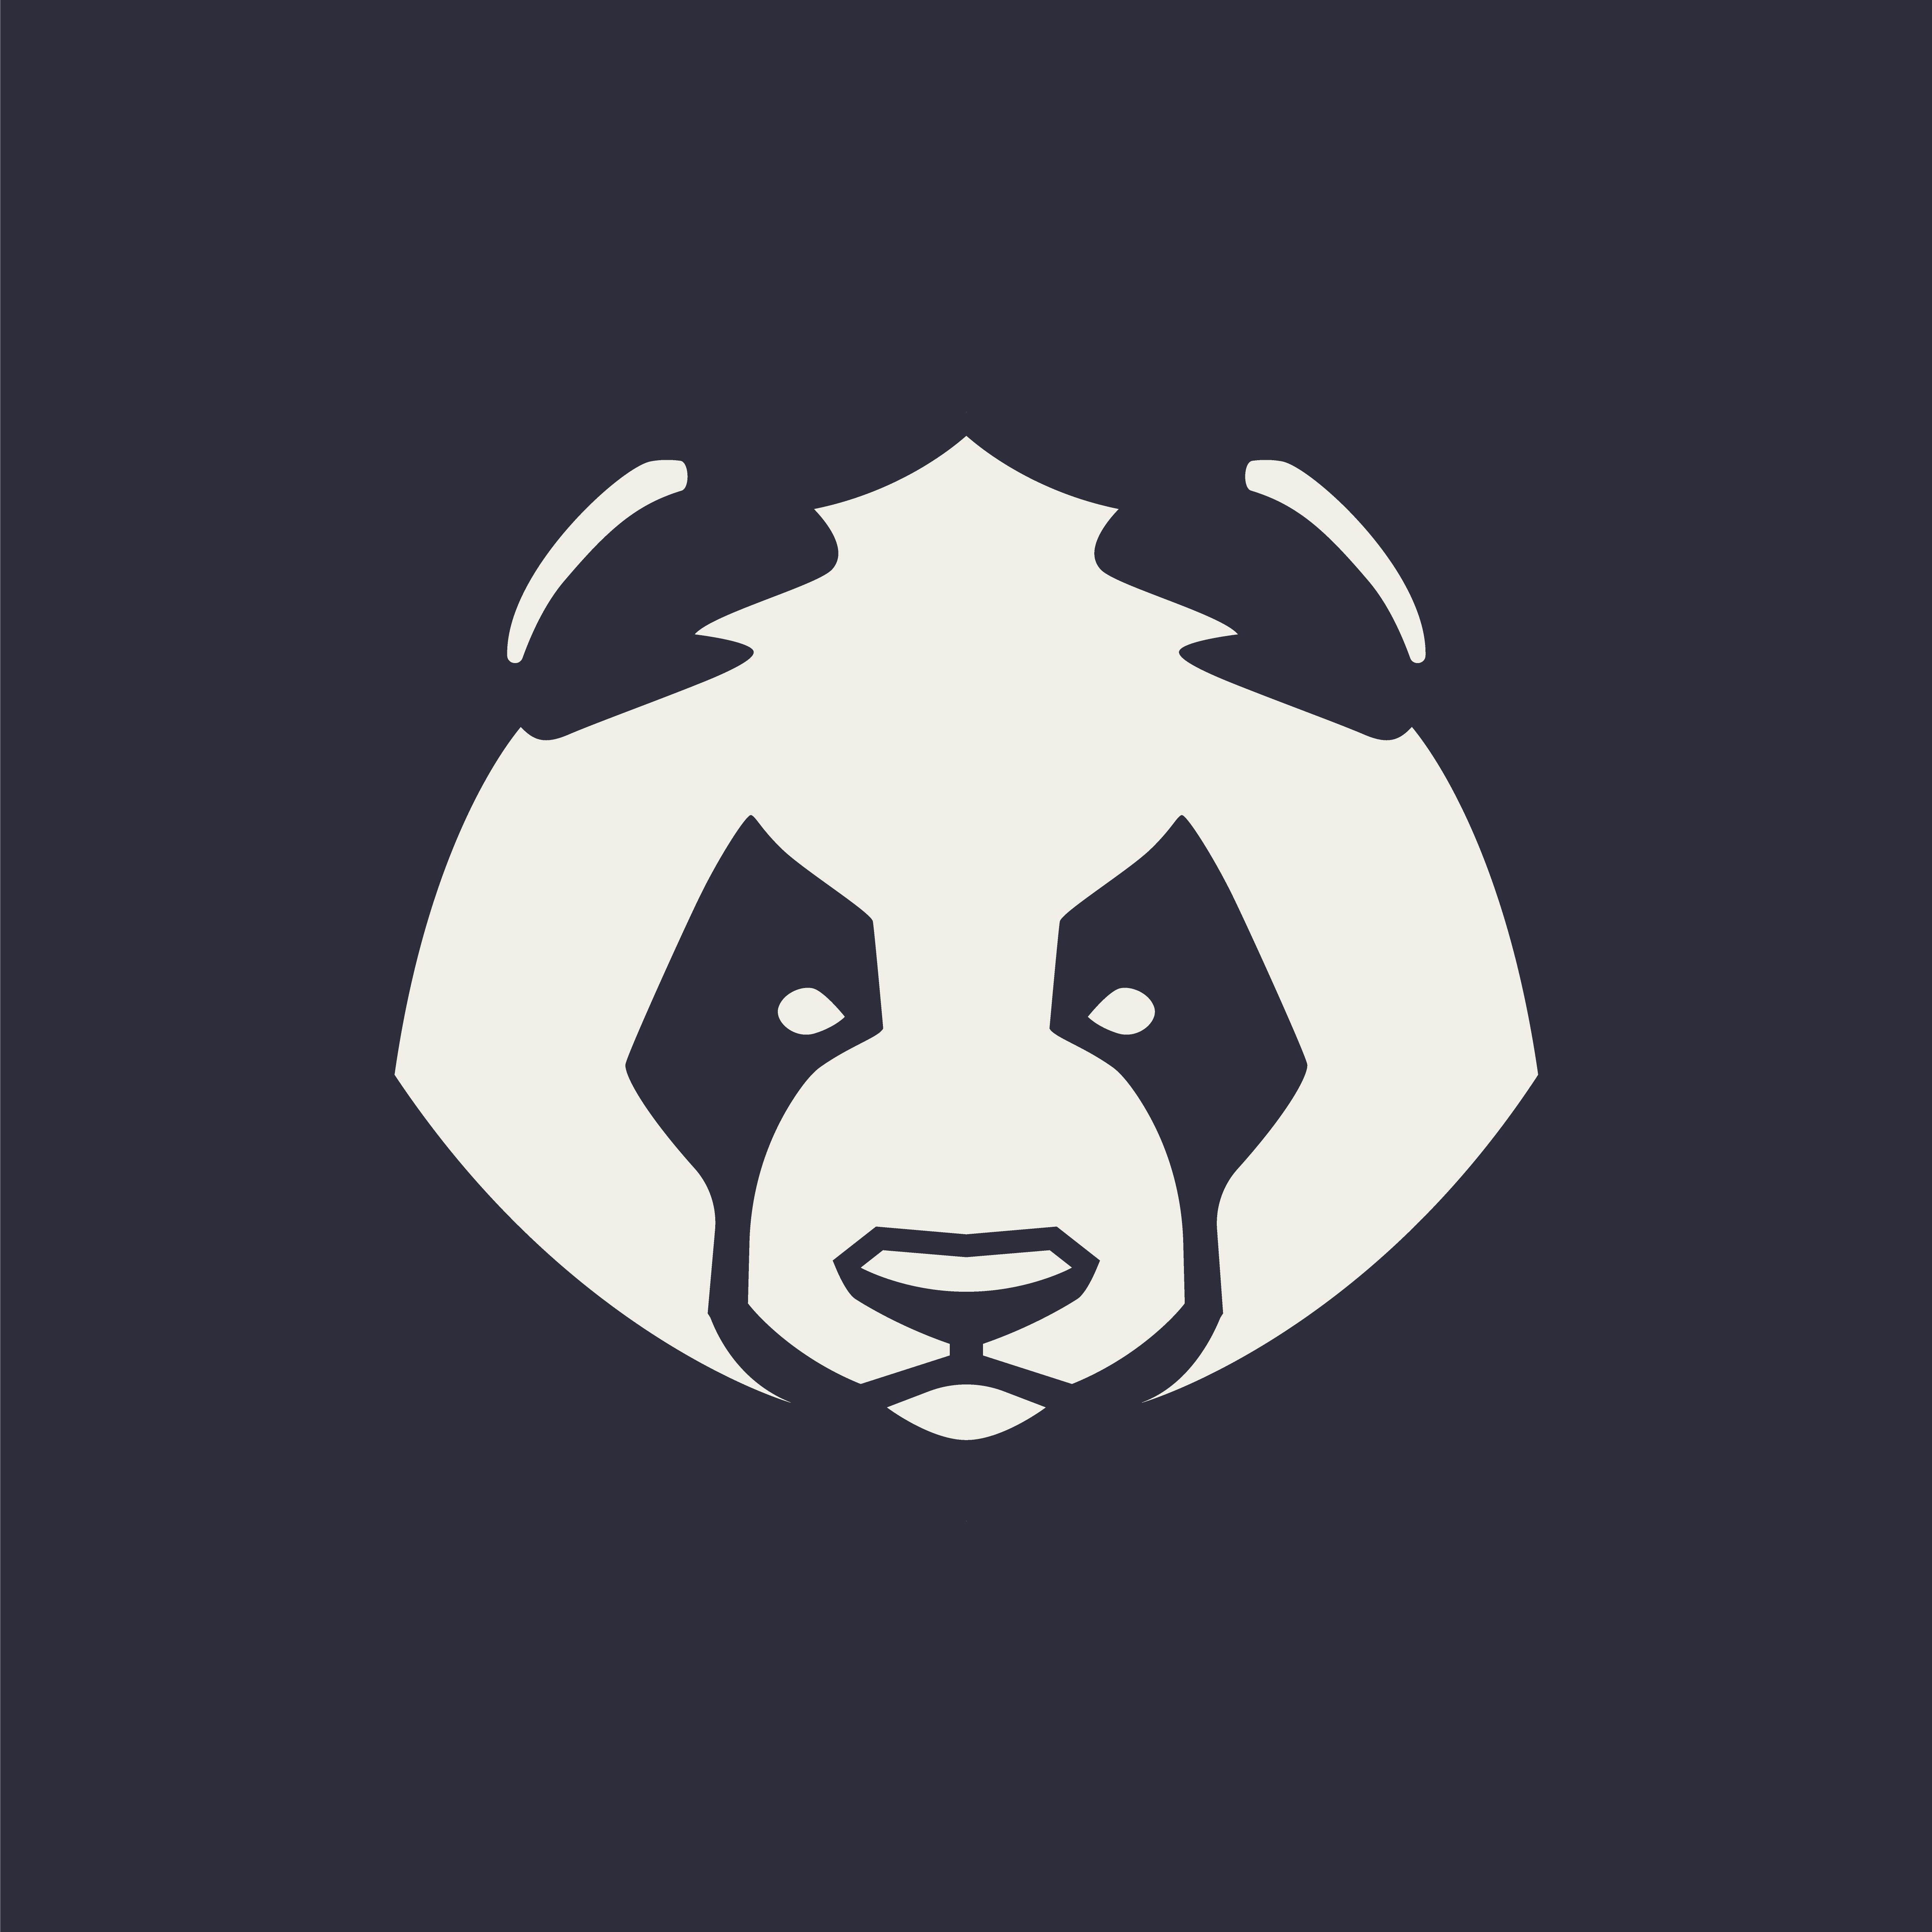 Panda Mascot Vector Icon.